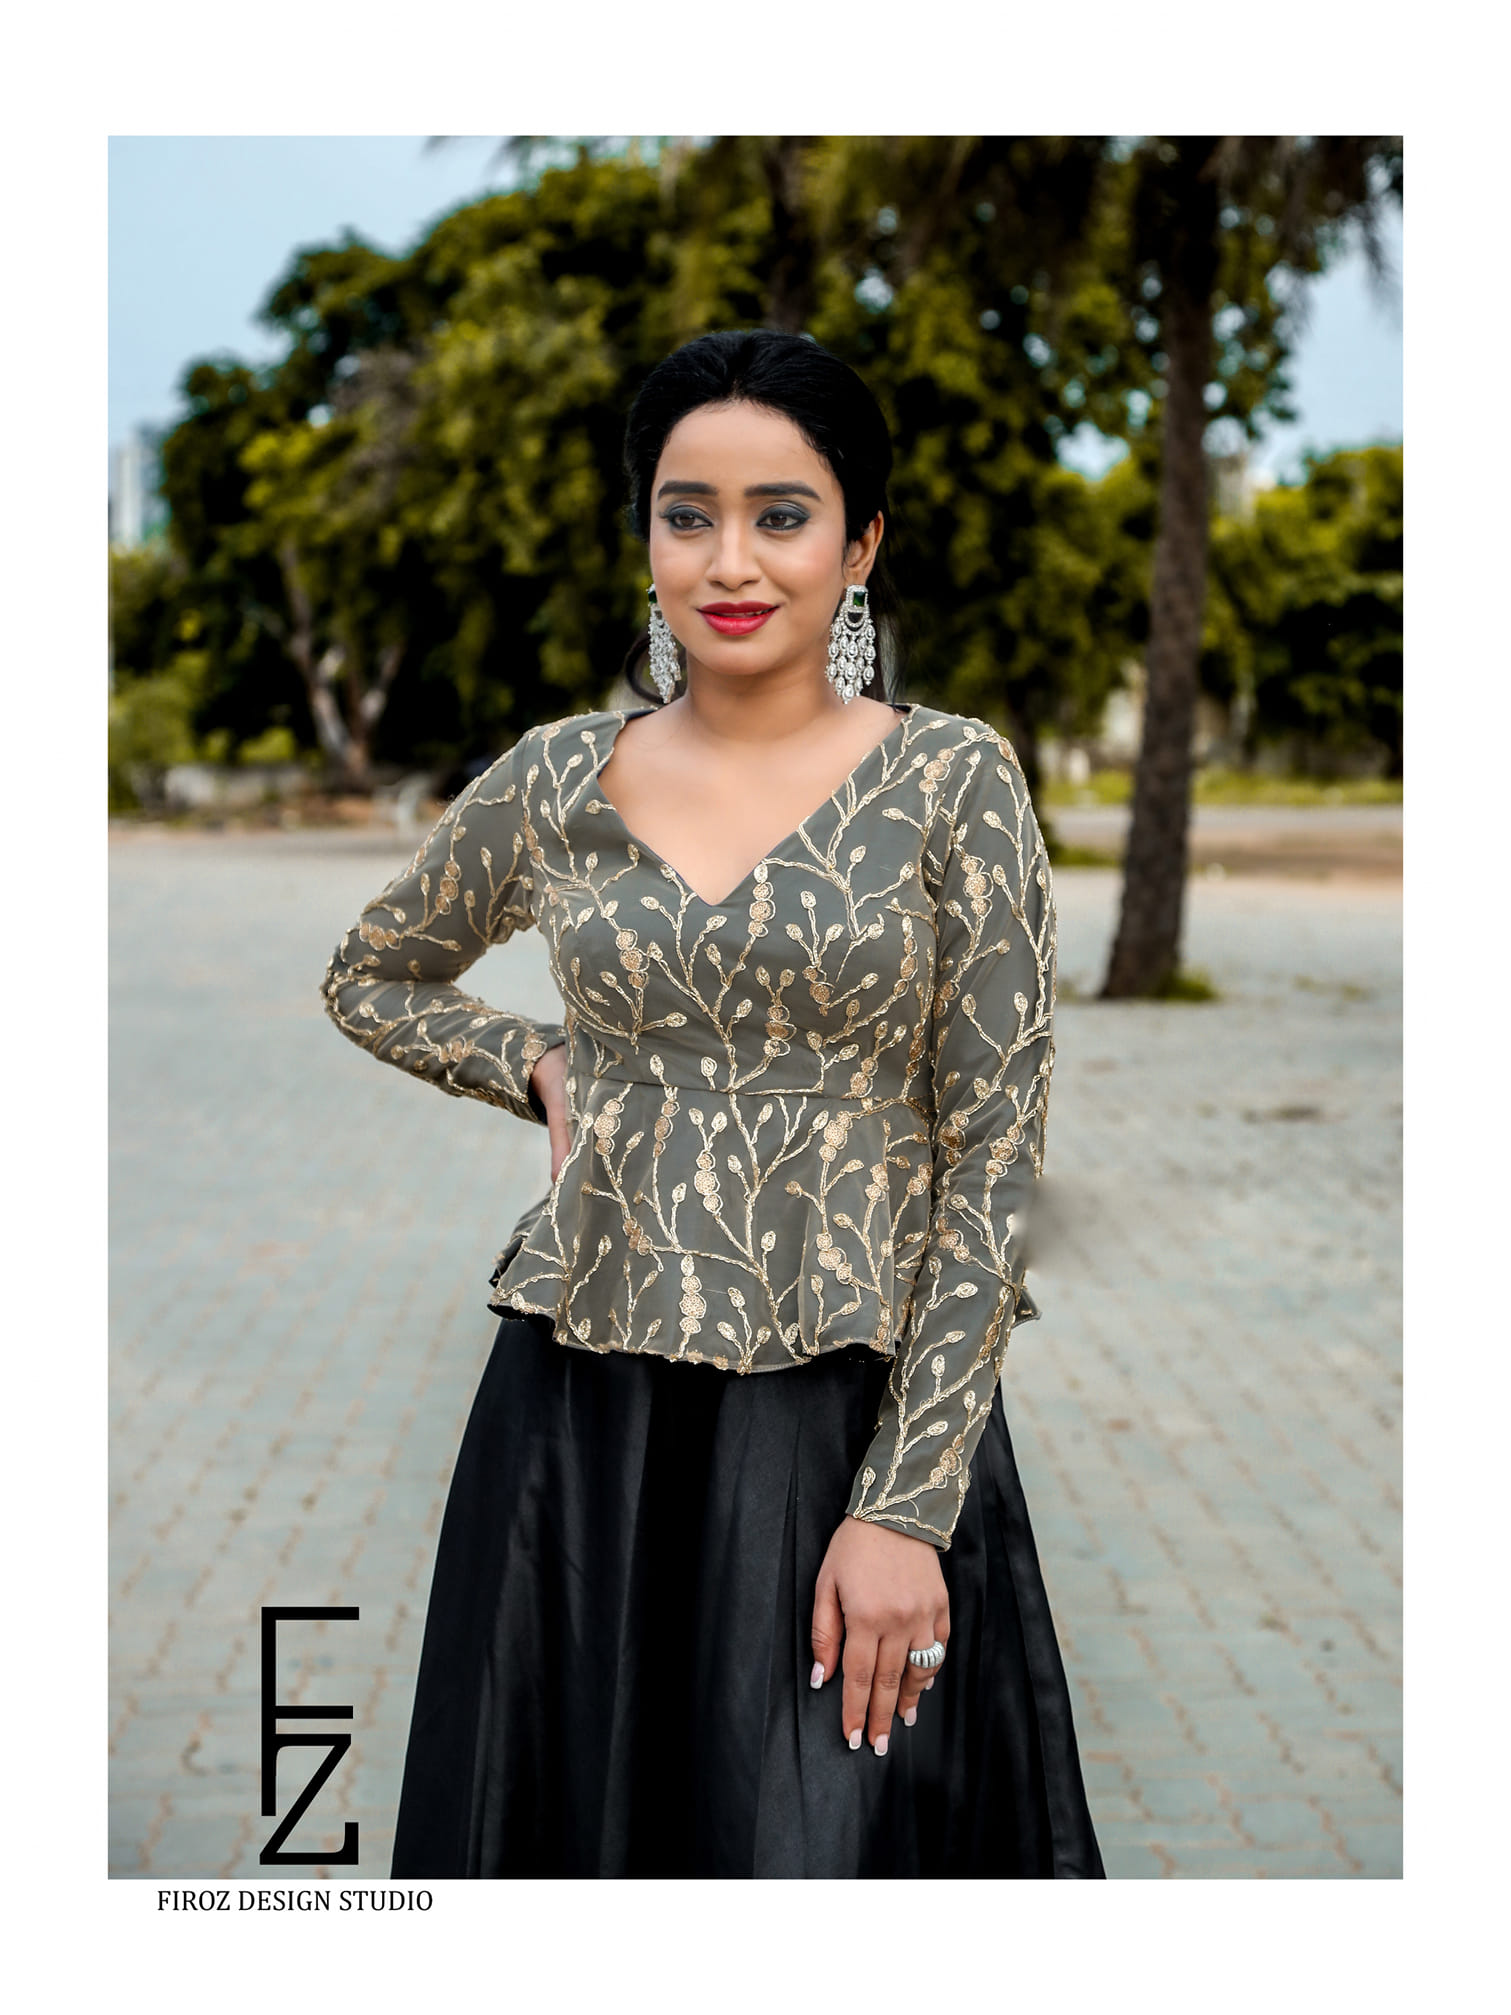 Beautiful and Charming Vindhya Vishaka in Firoz Design Studio Outfit. 2021-04-25